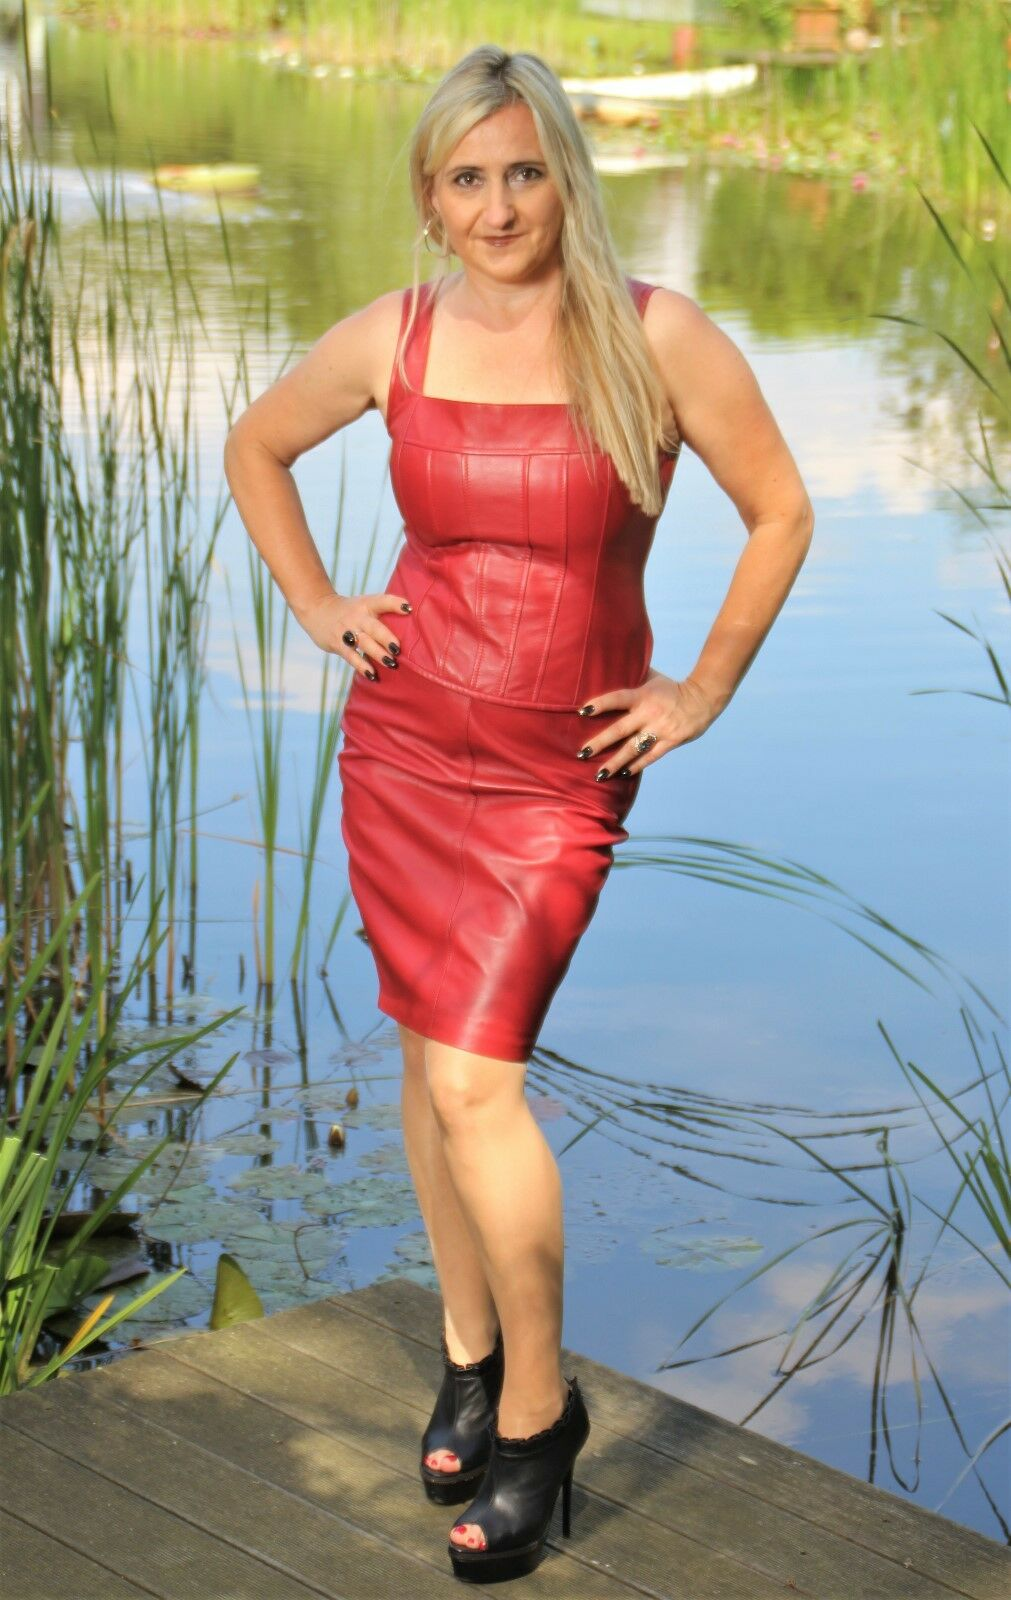 427a219001f7 Lederrock Bleistiftrock Soft ECHT-Leder in in in elegant rot für ...